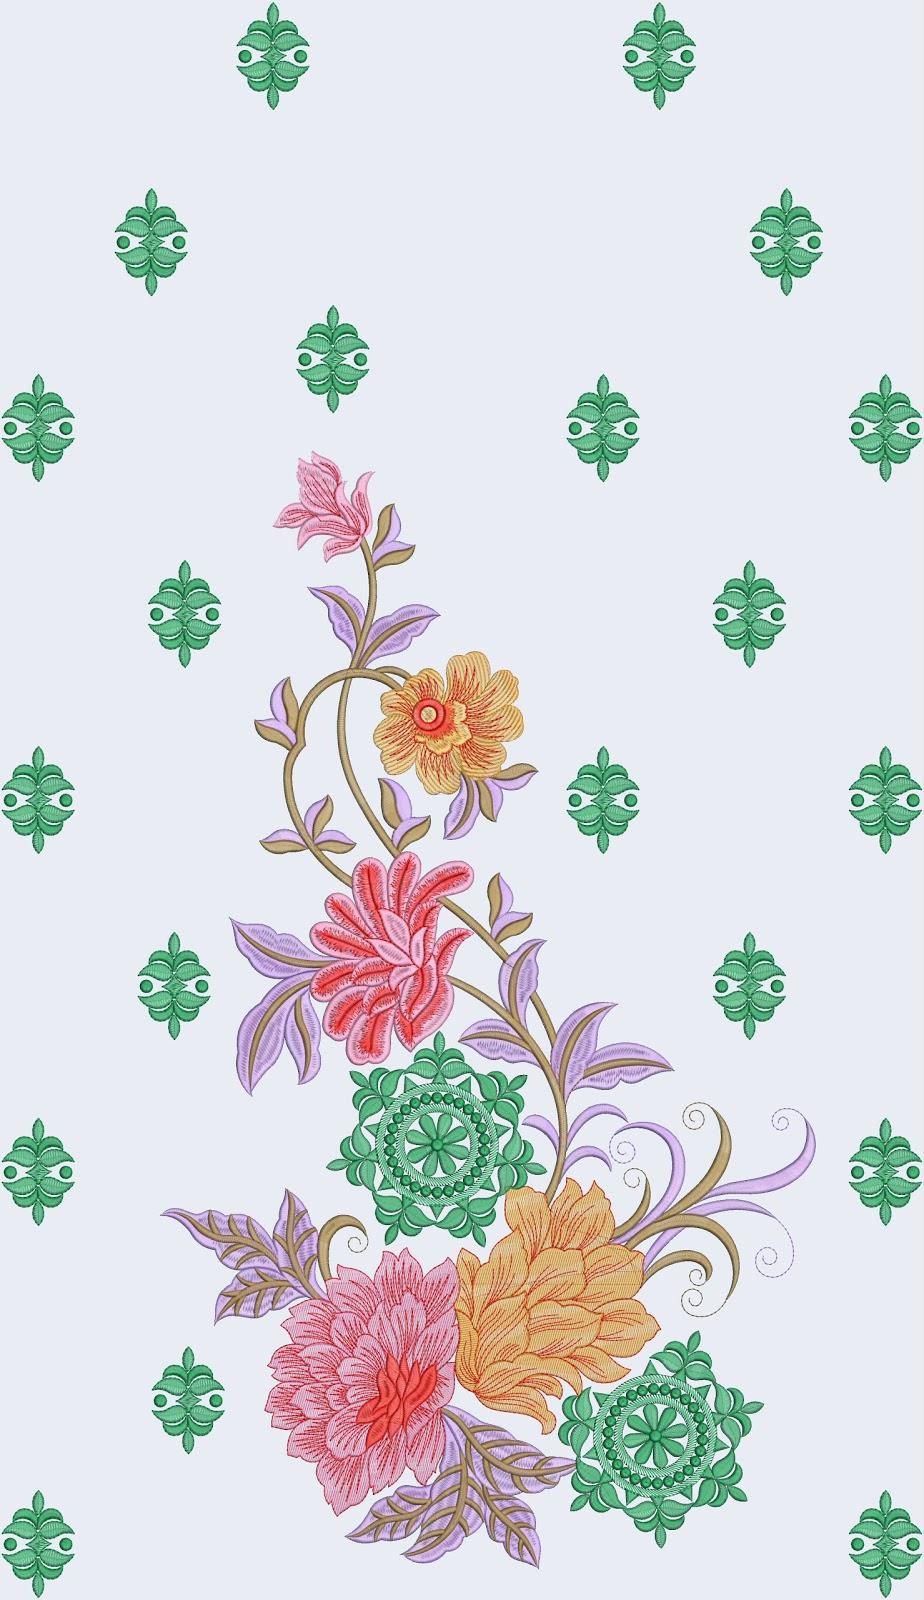 29 popular embroidery patterns for kameez makaroka pakistani salwar kameez embroidery designs embdesigntube bankloansurffo Gallery